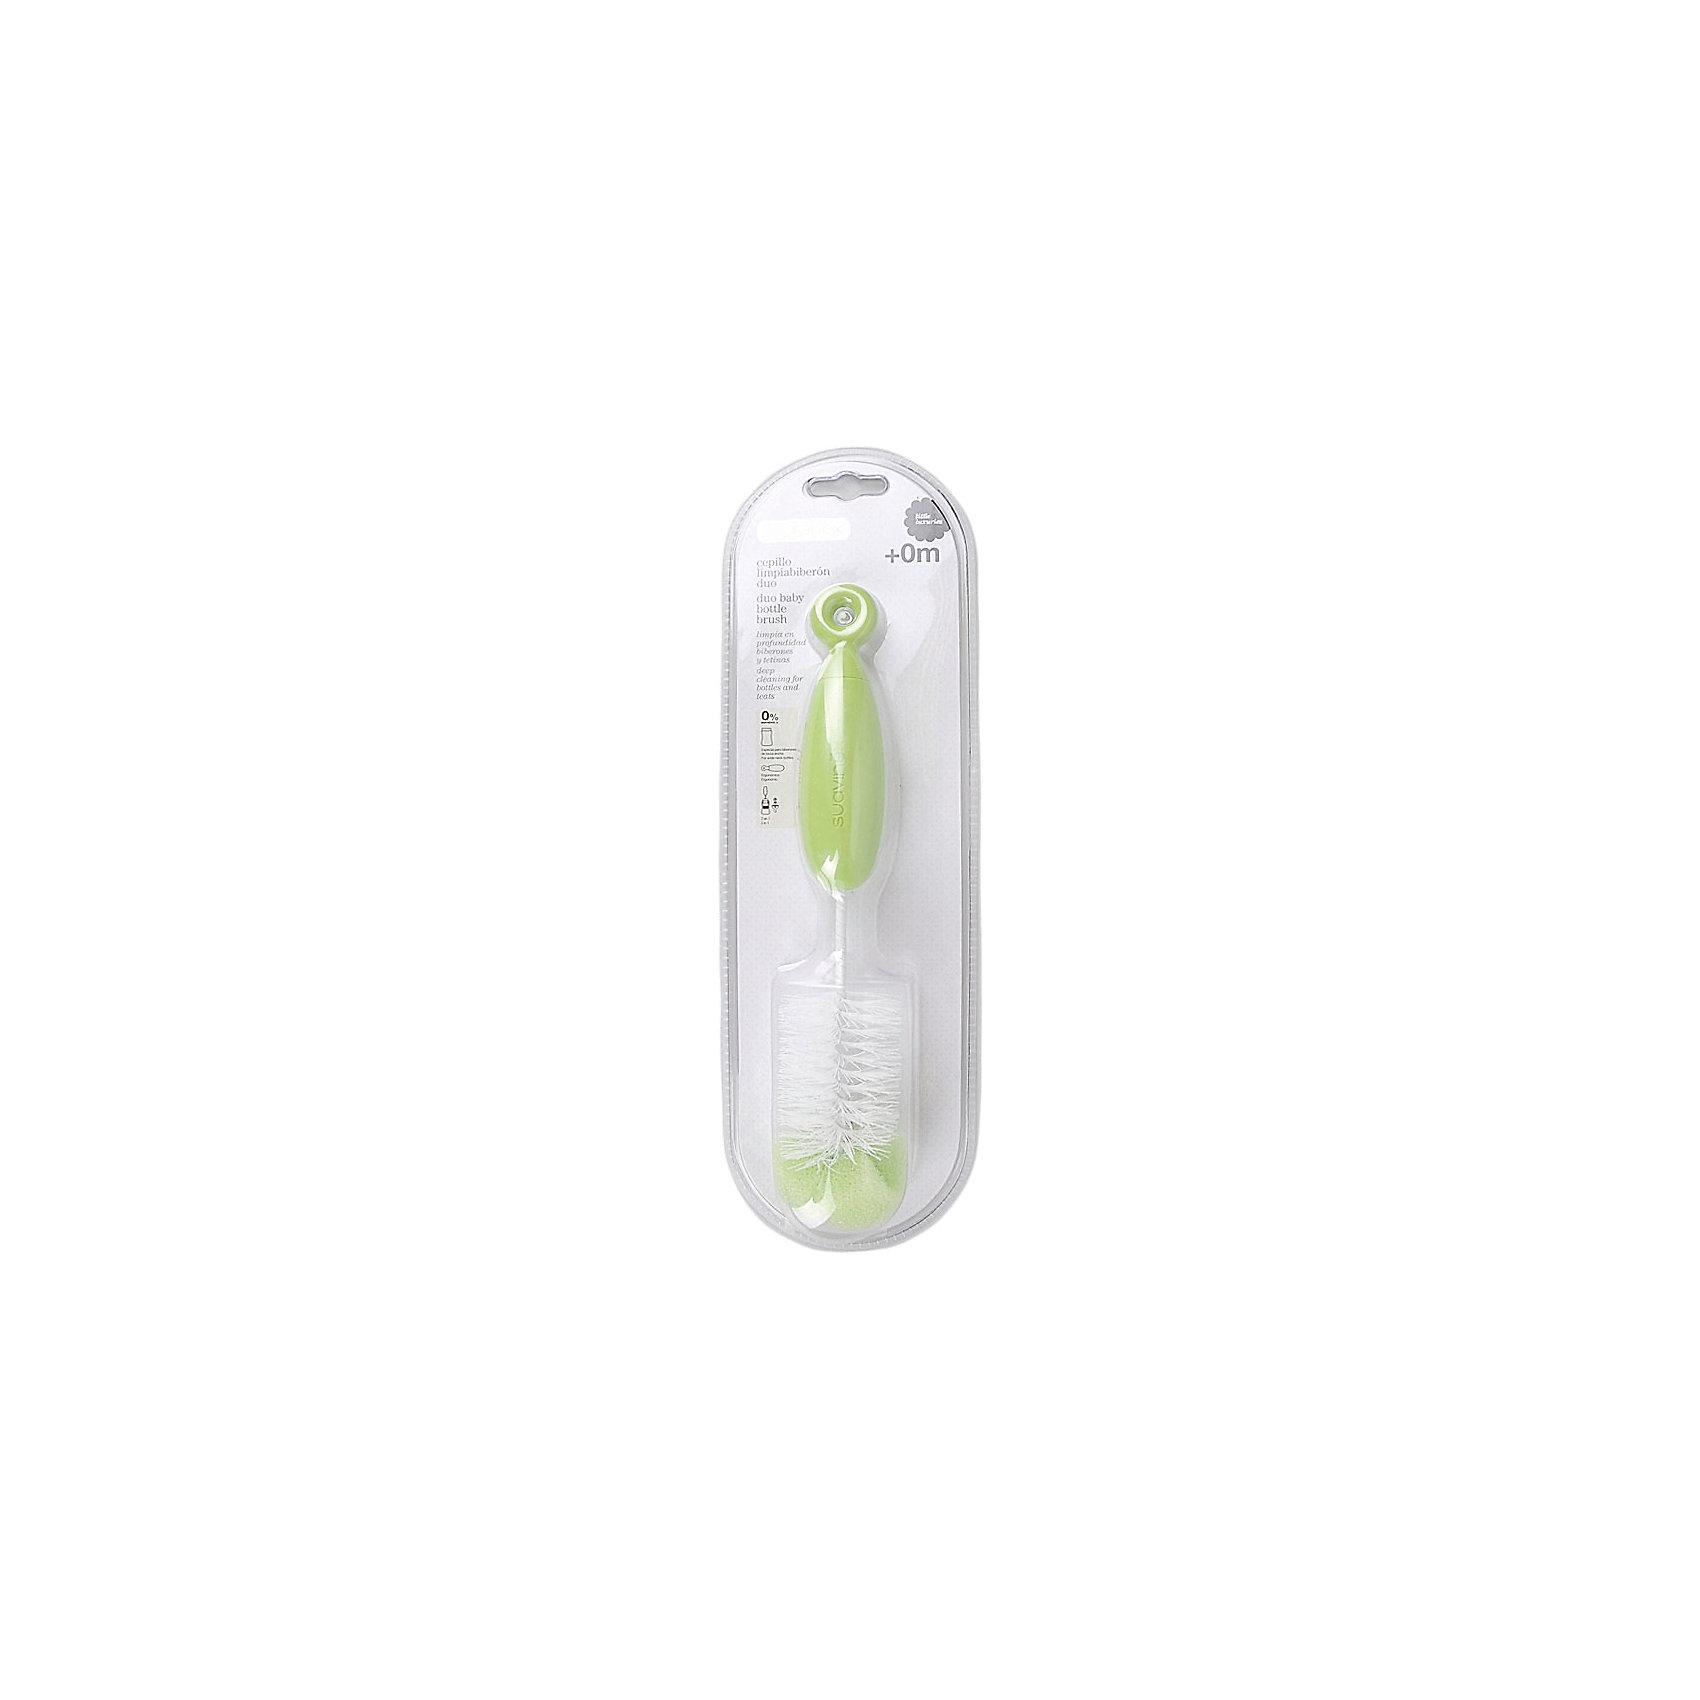 Ершик для бутылочек от 0 мес, Suavinex, зеленый